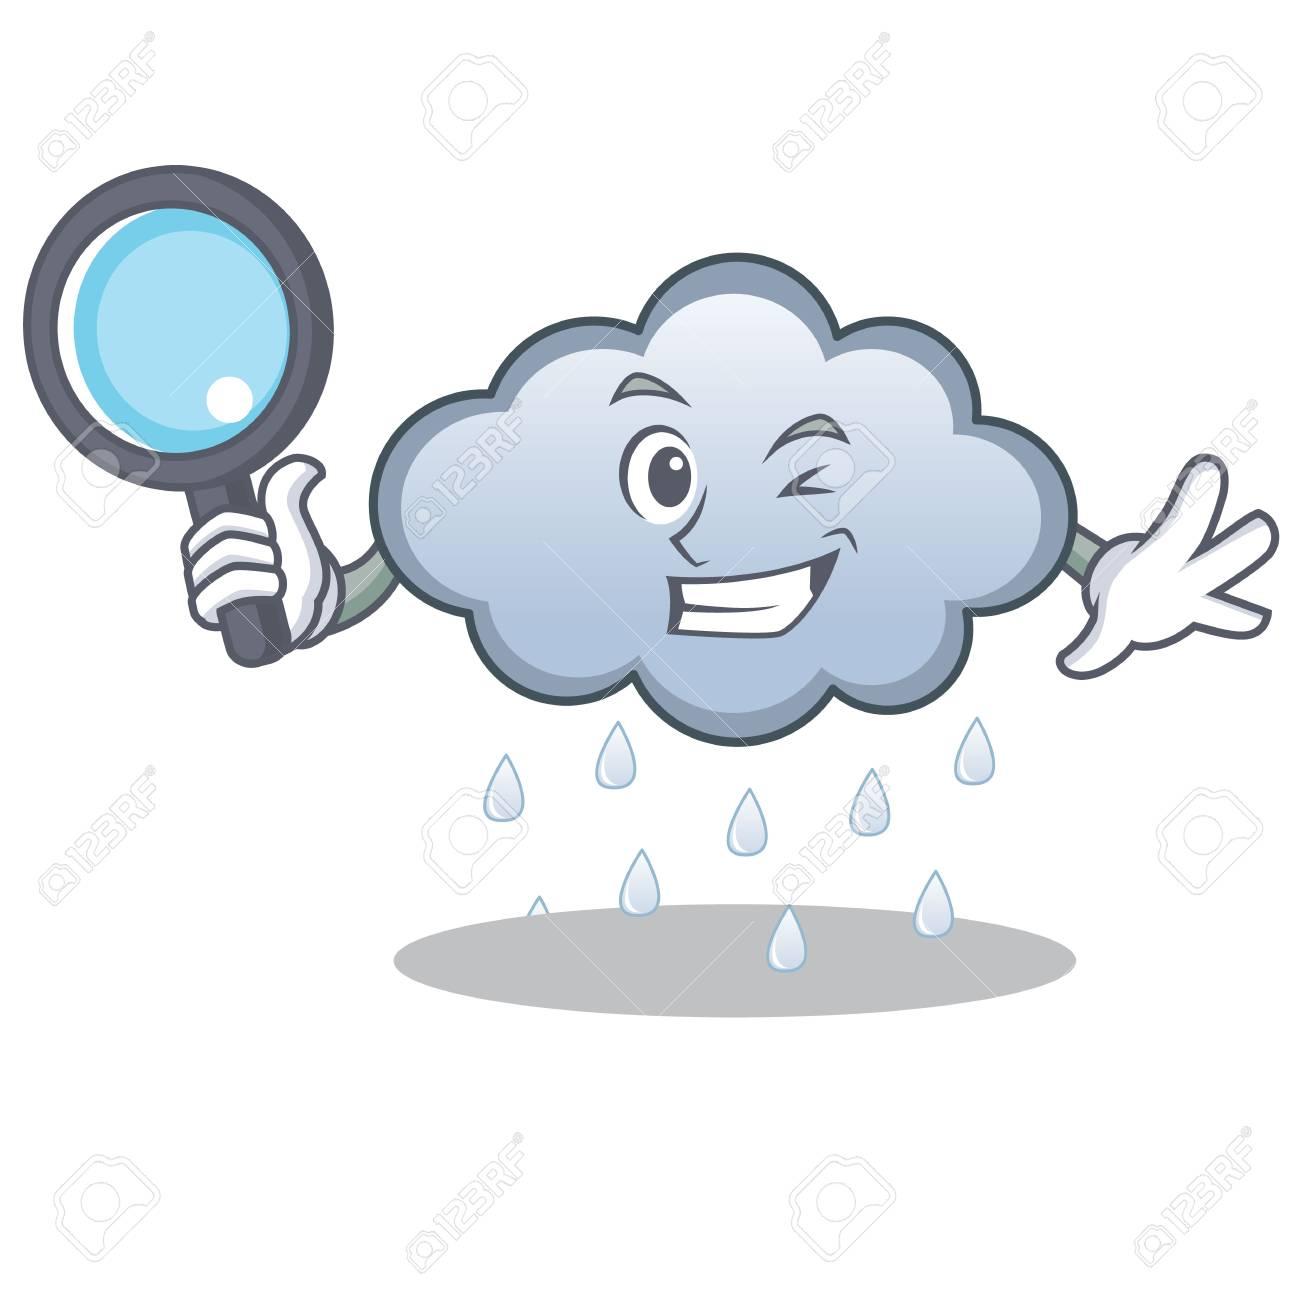 Detective rain cloud character cartoon.